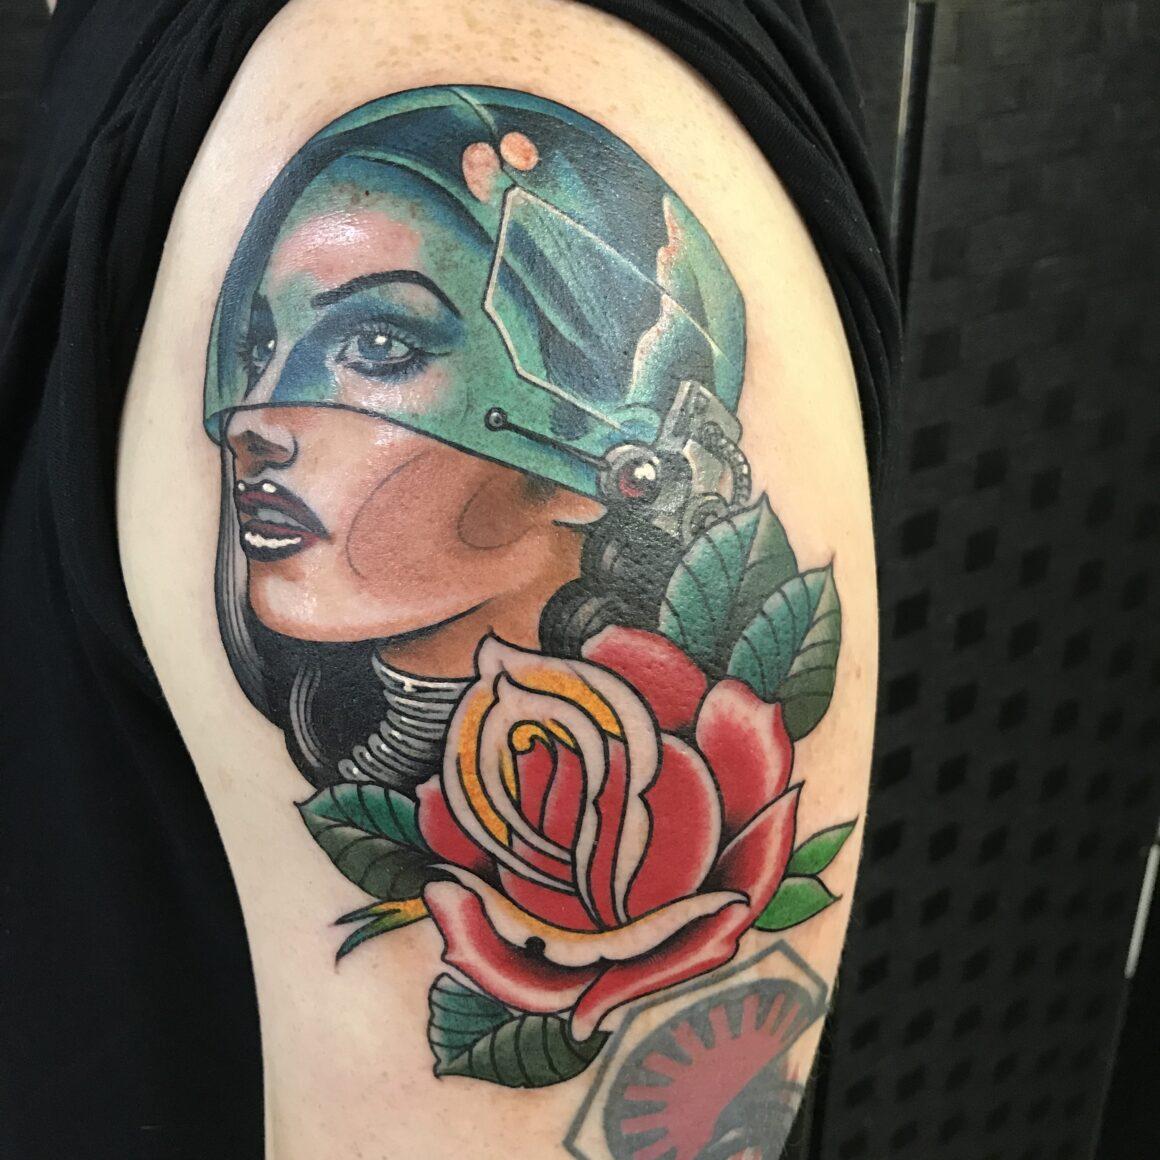 Loz, Circle of Swords Tattoo Studio, Worcester (UK)